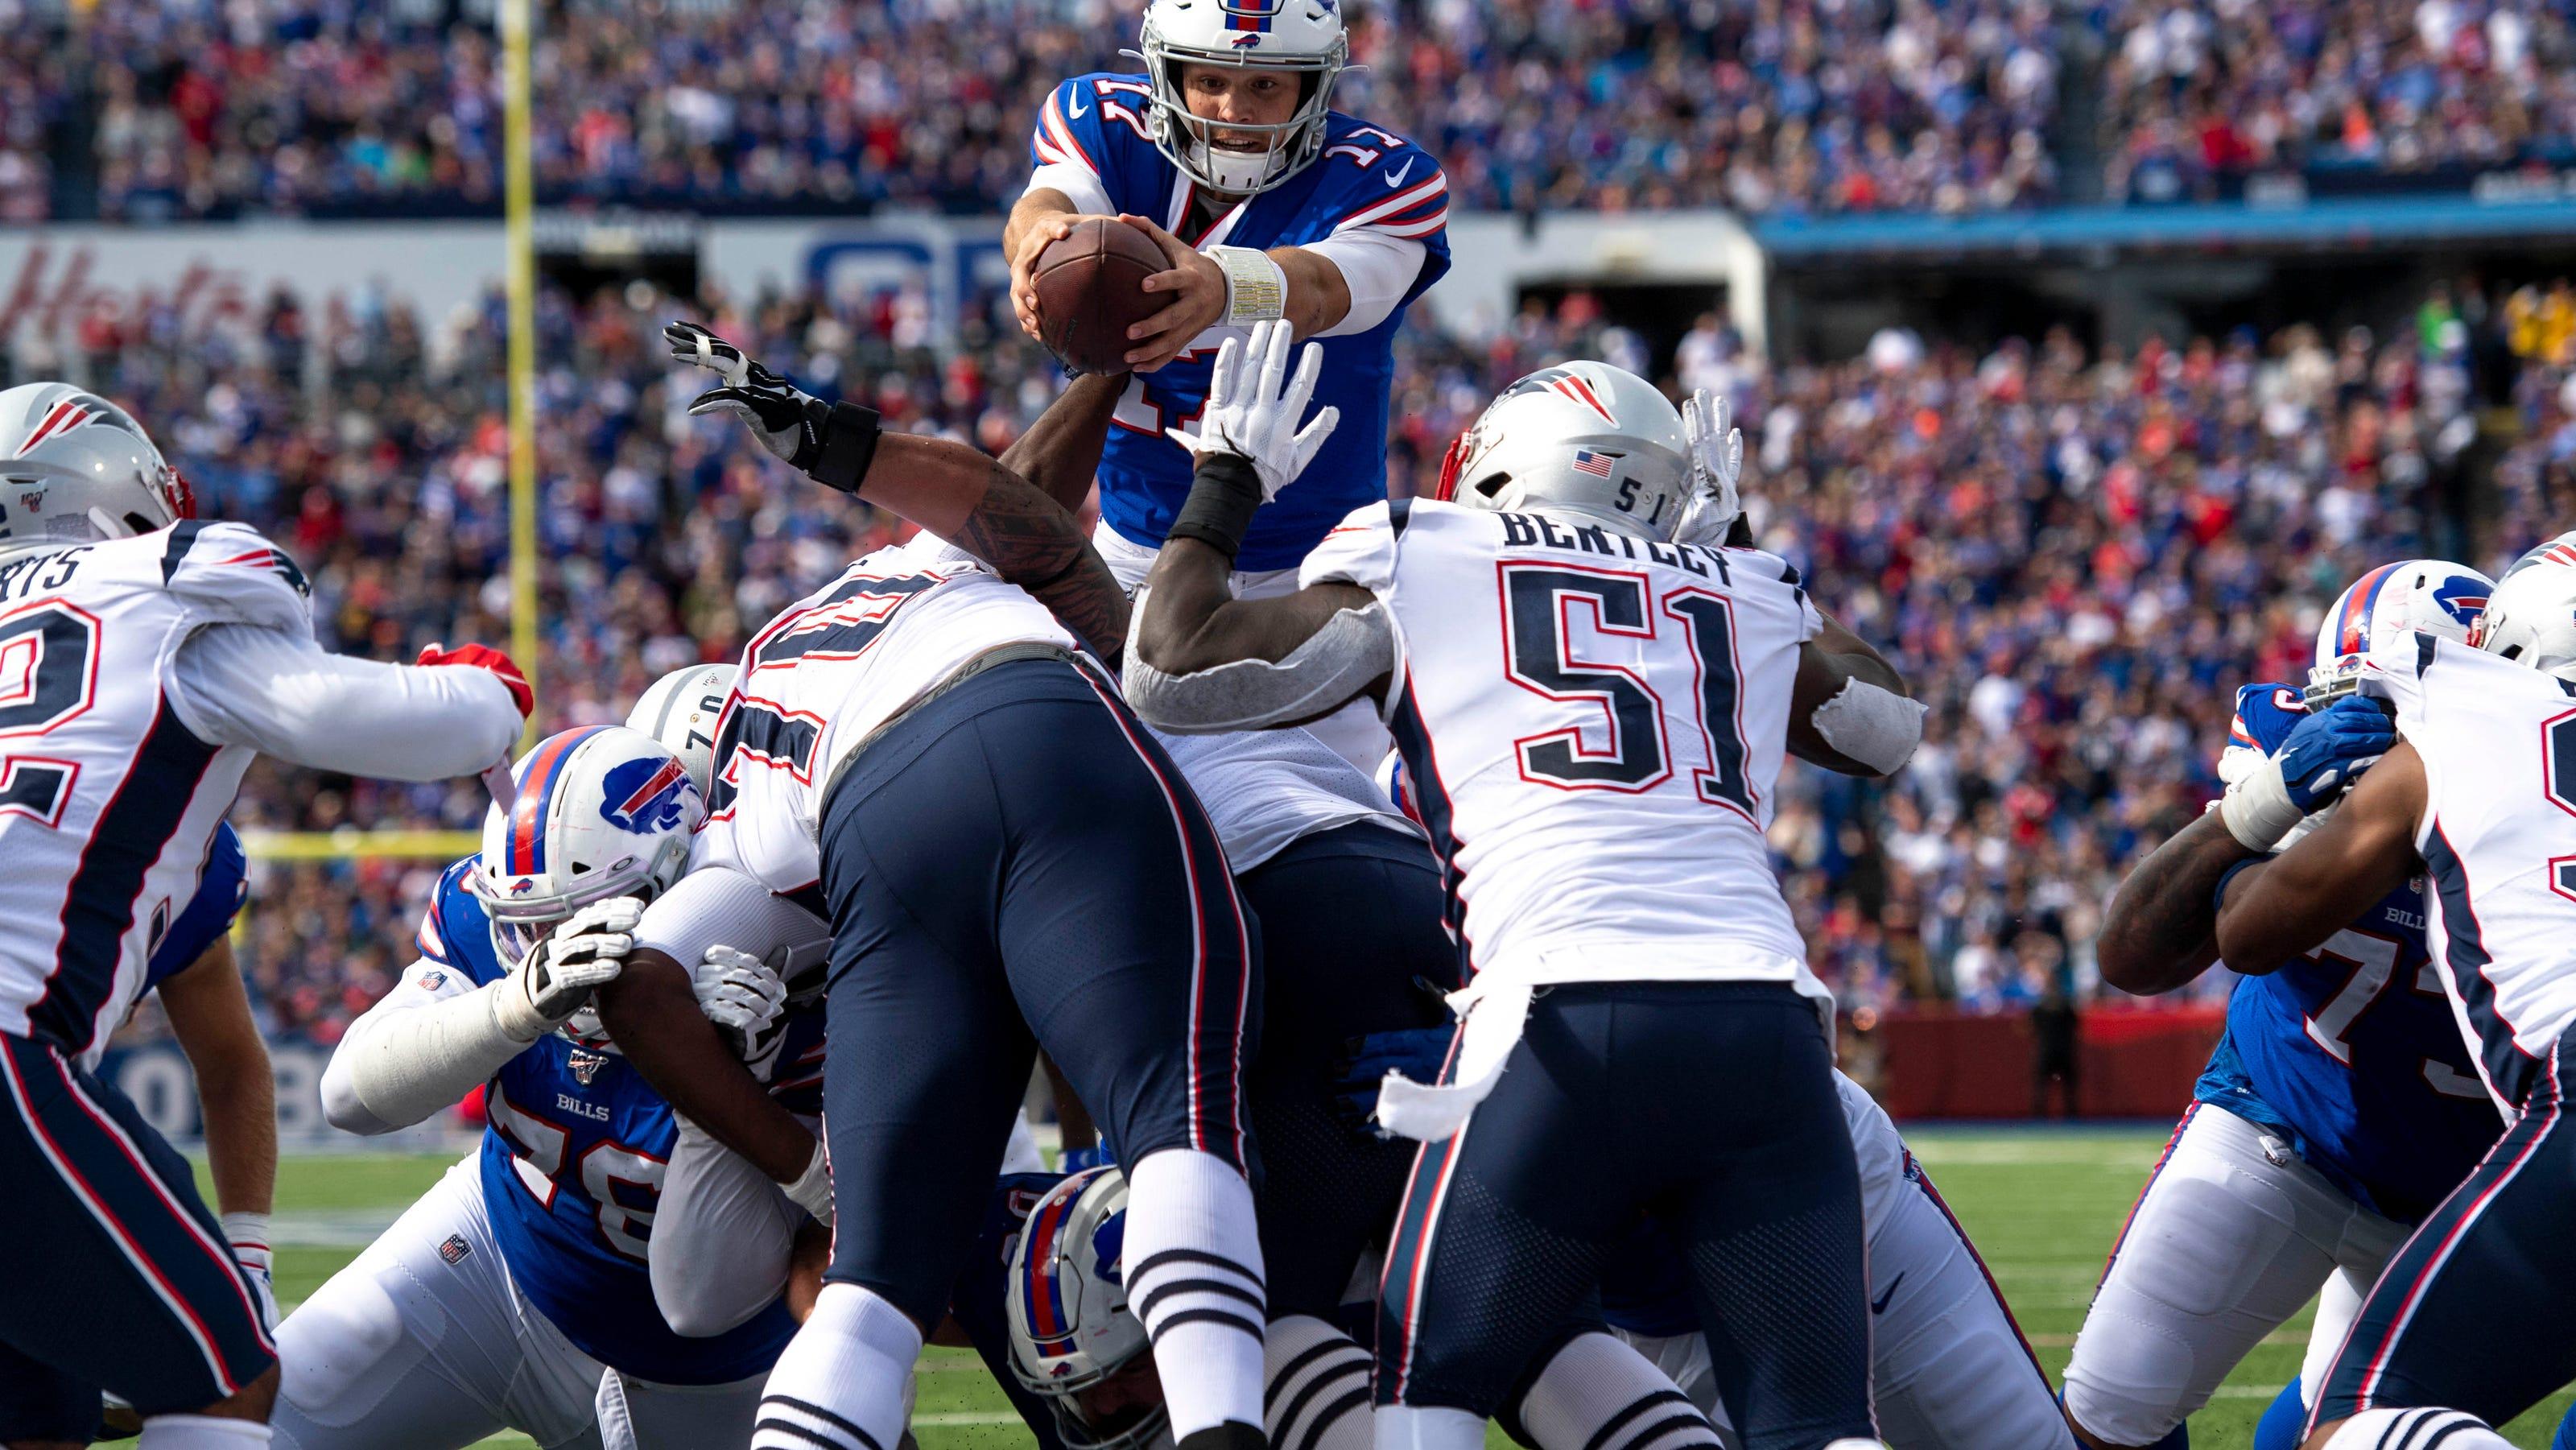 New England Patriots 16, Buffalo Bills 10: Final score, highlights, recap